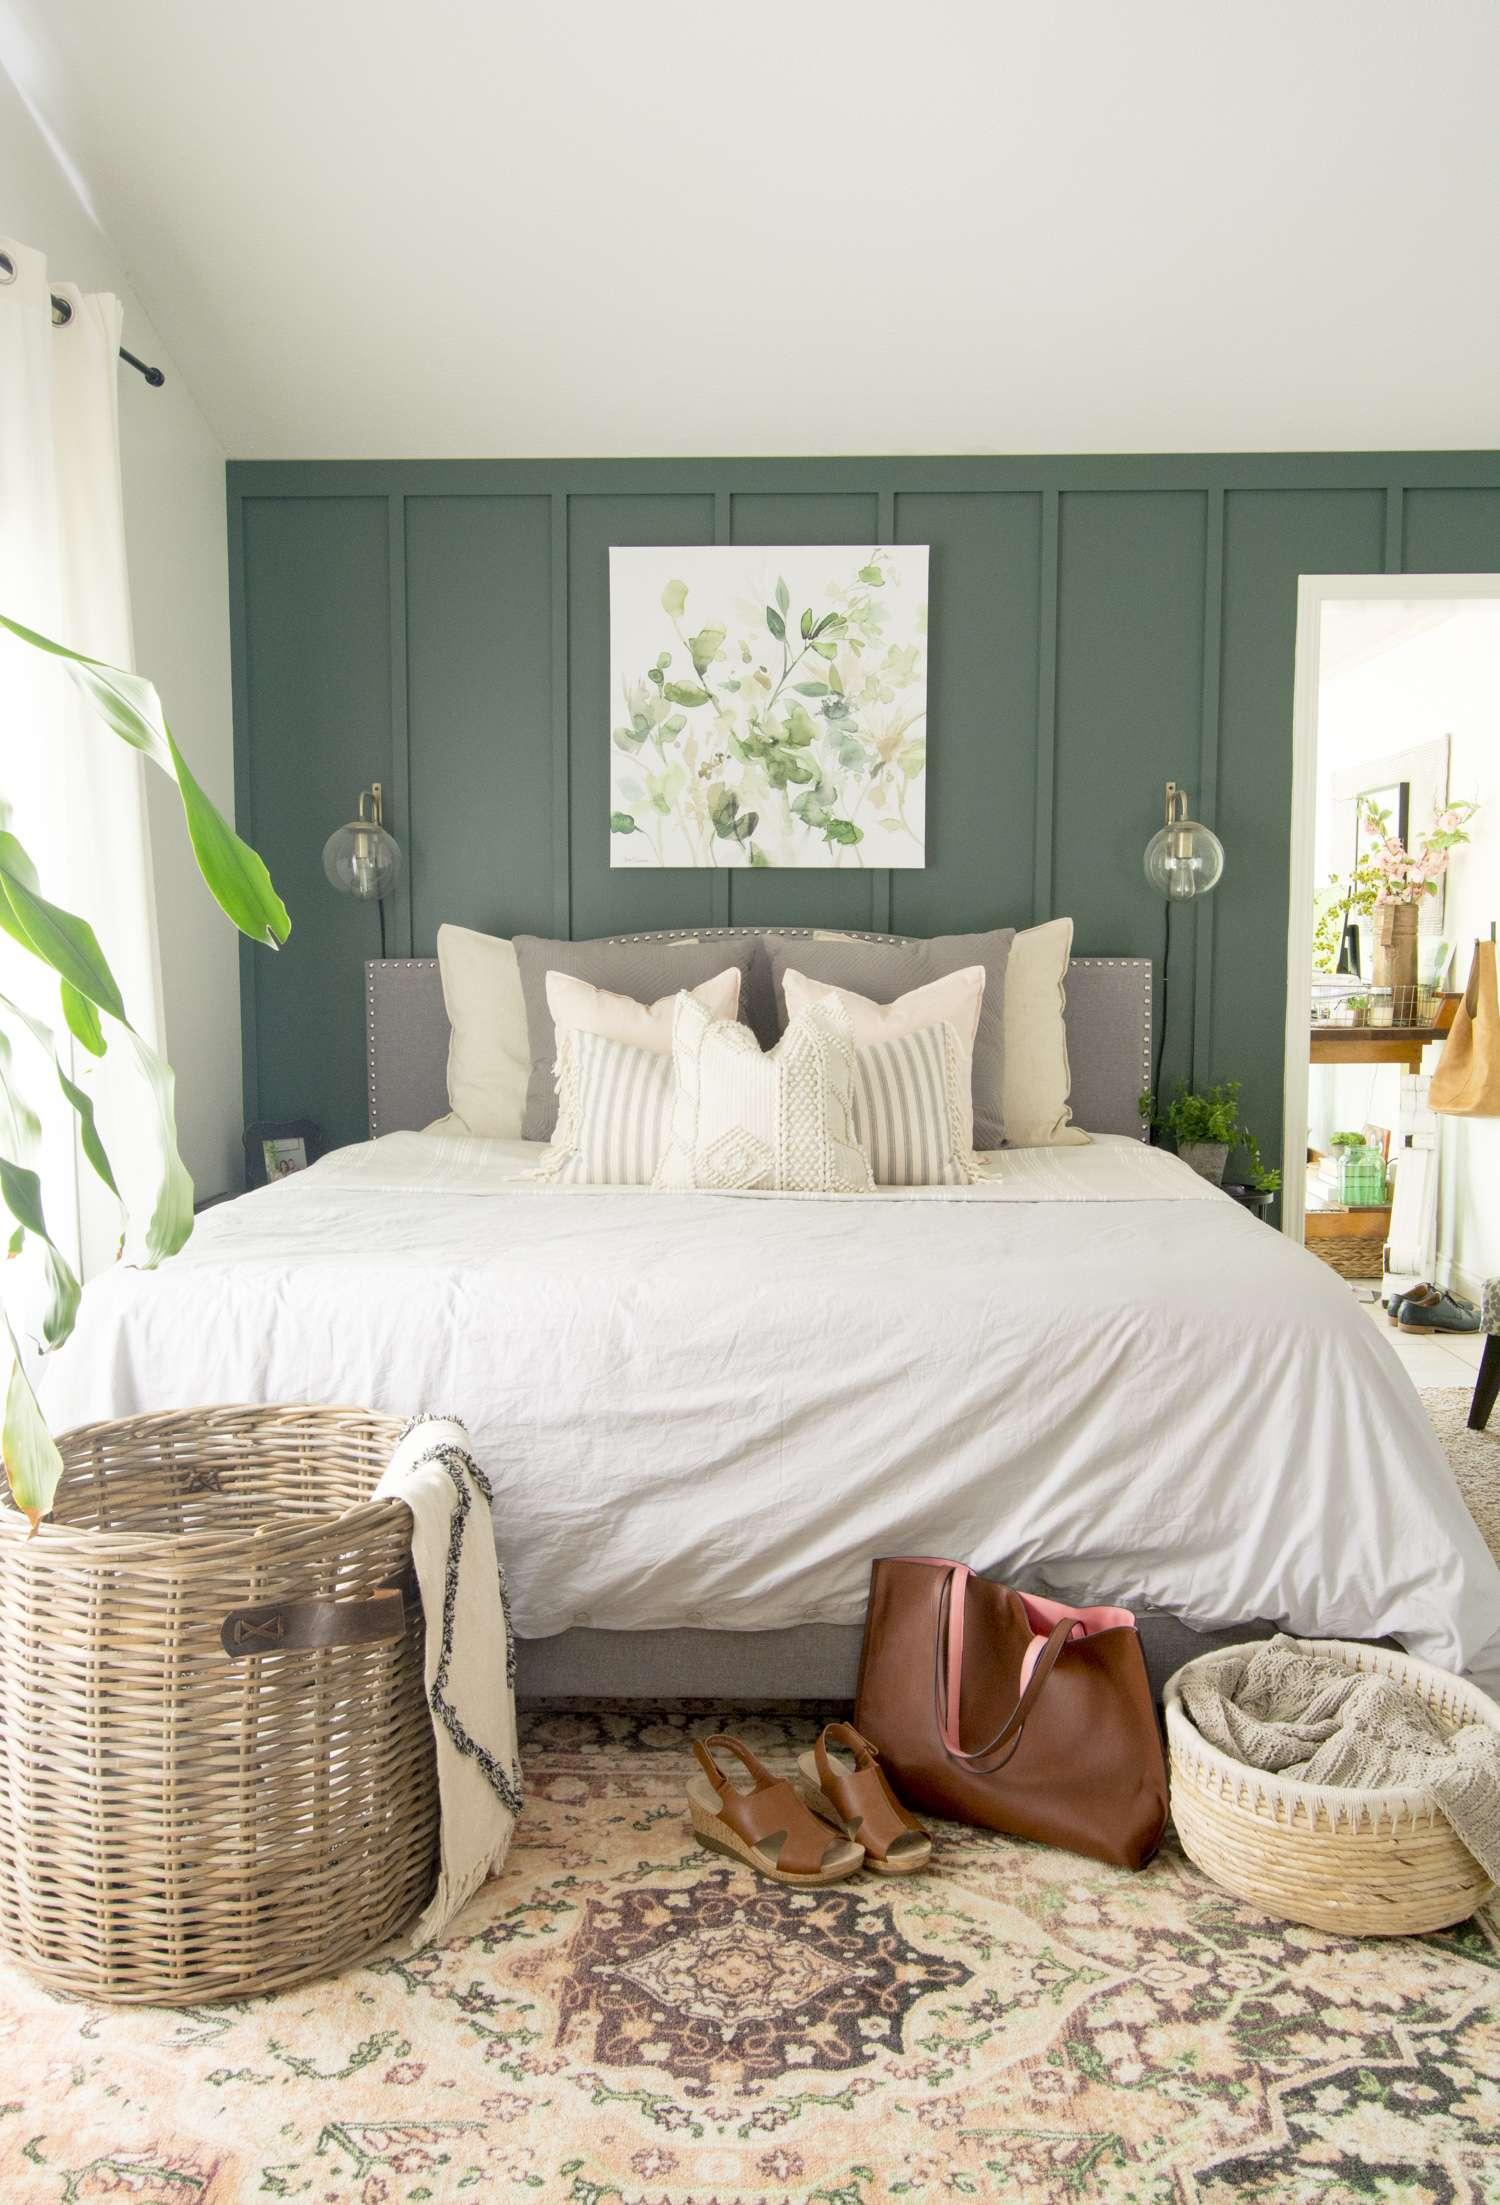 How to style modern farmhouse bedding